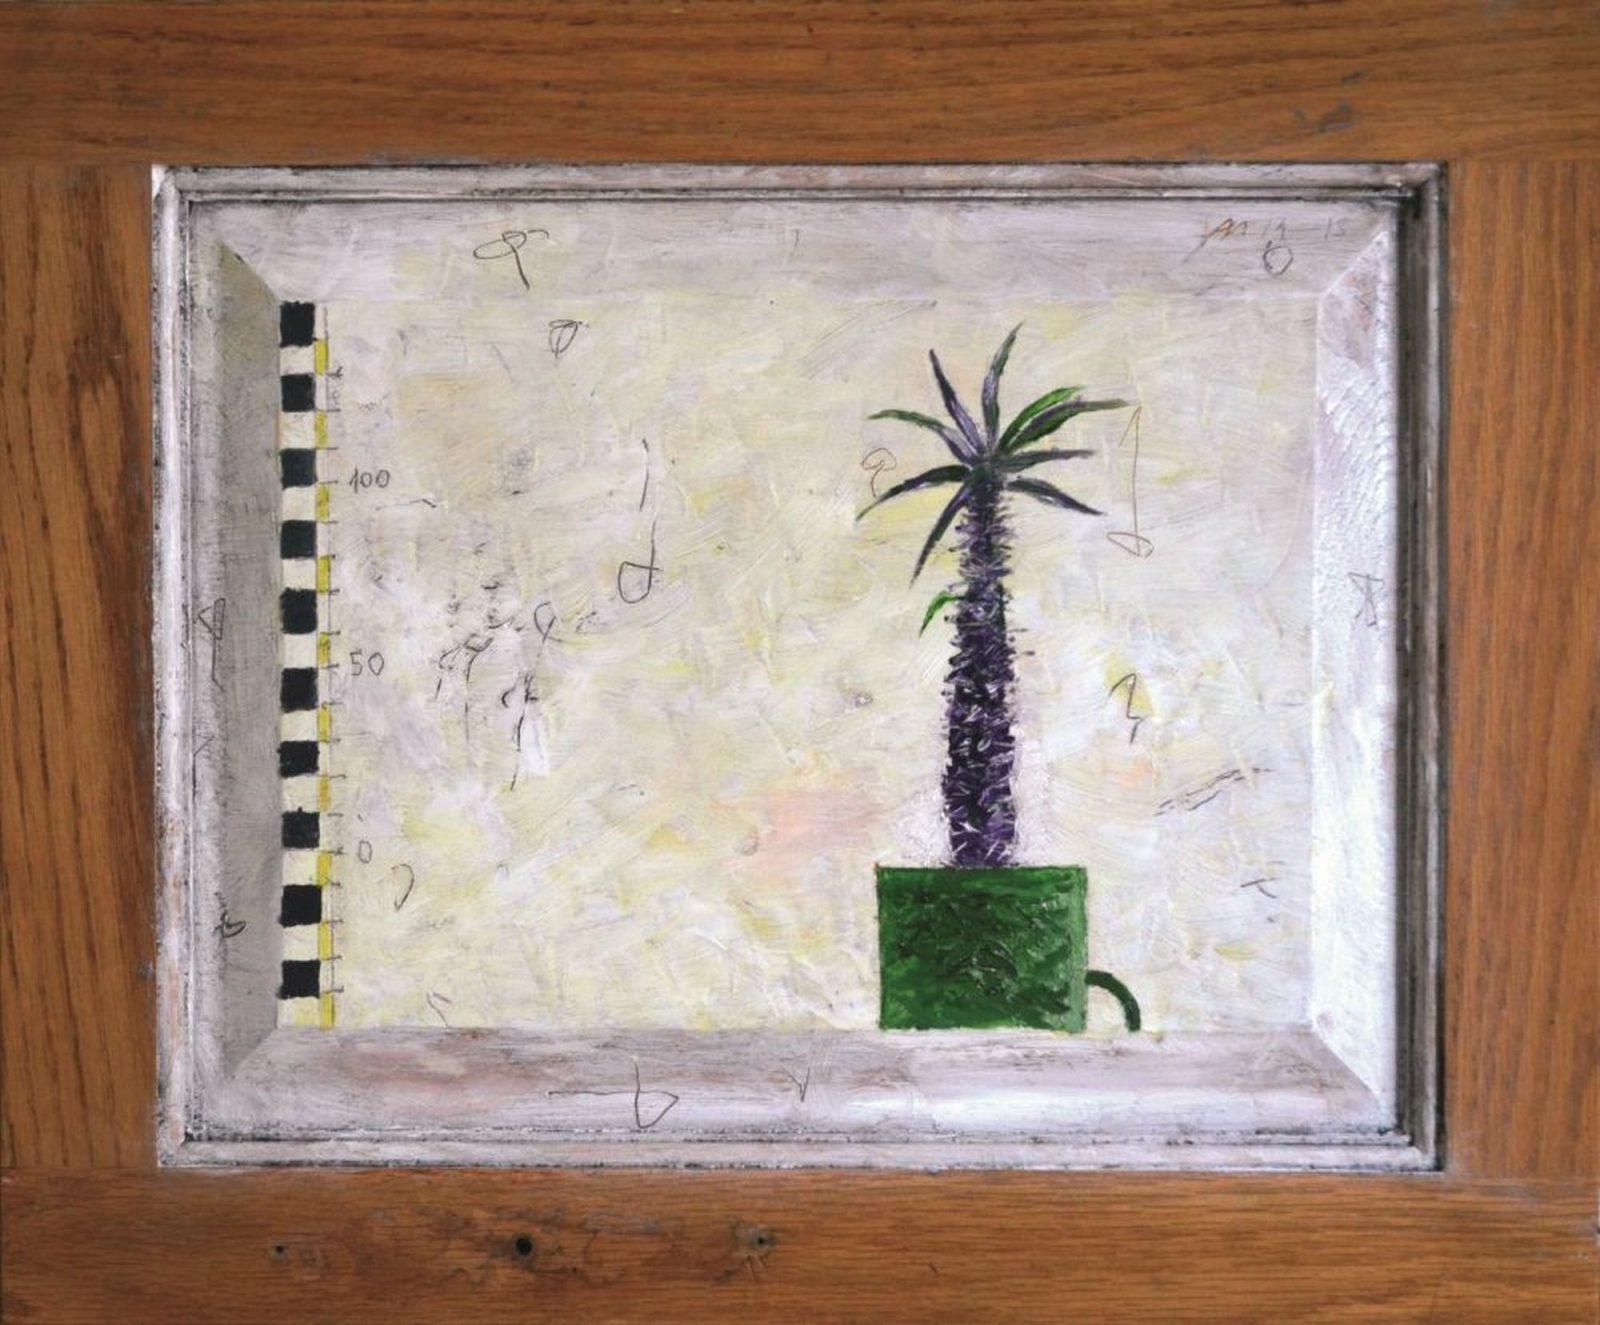 aatoth franyo: 137 cm magas növény